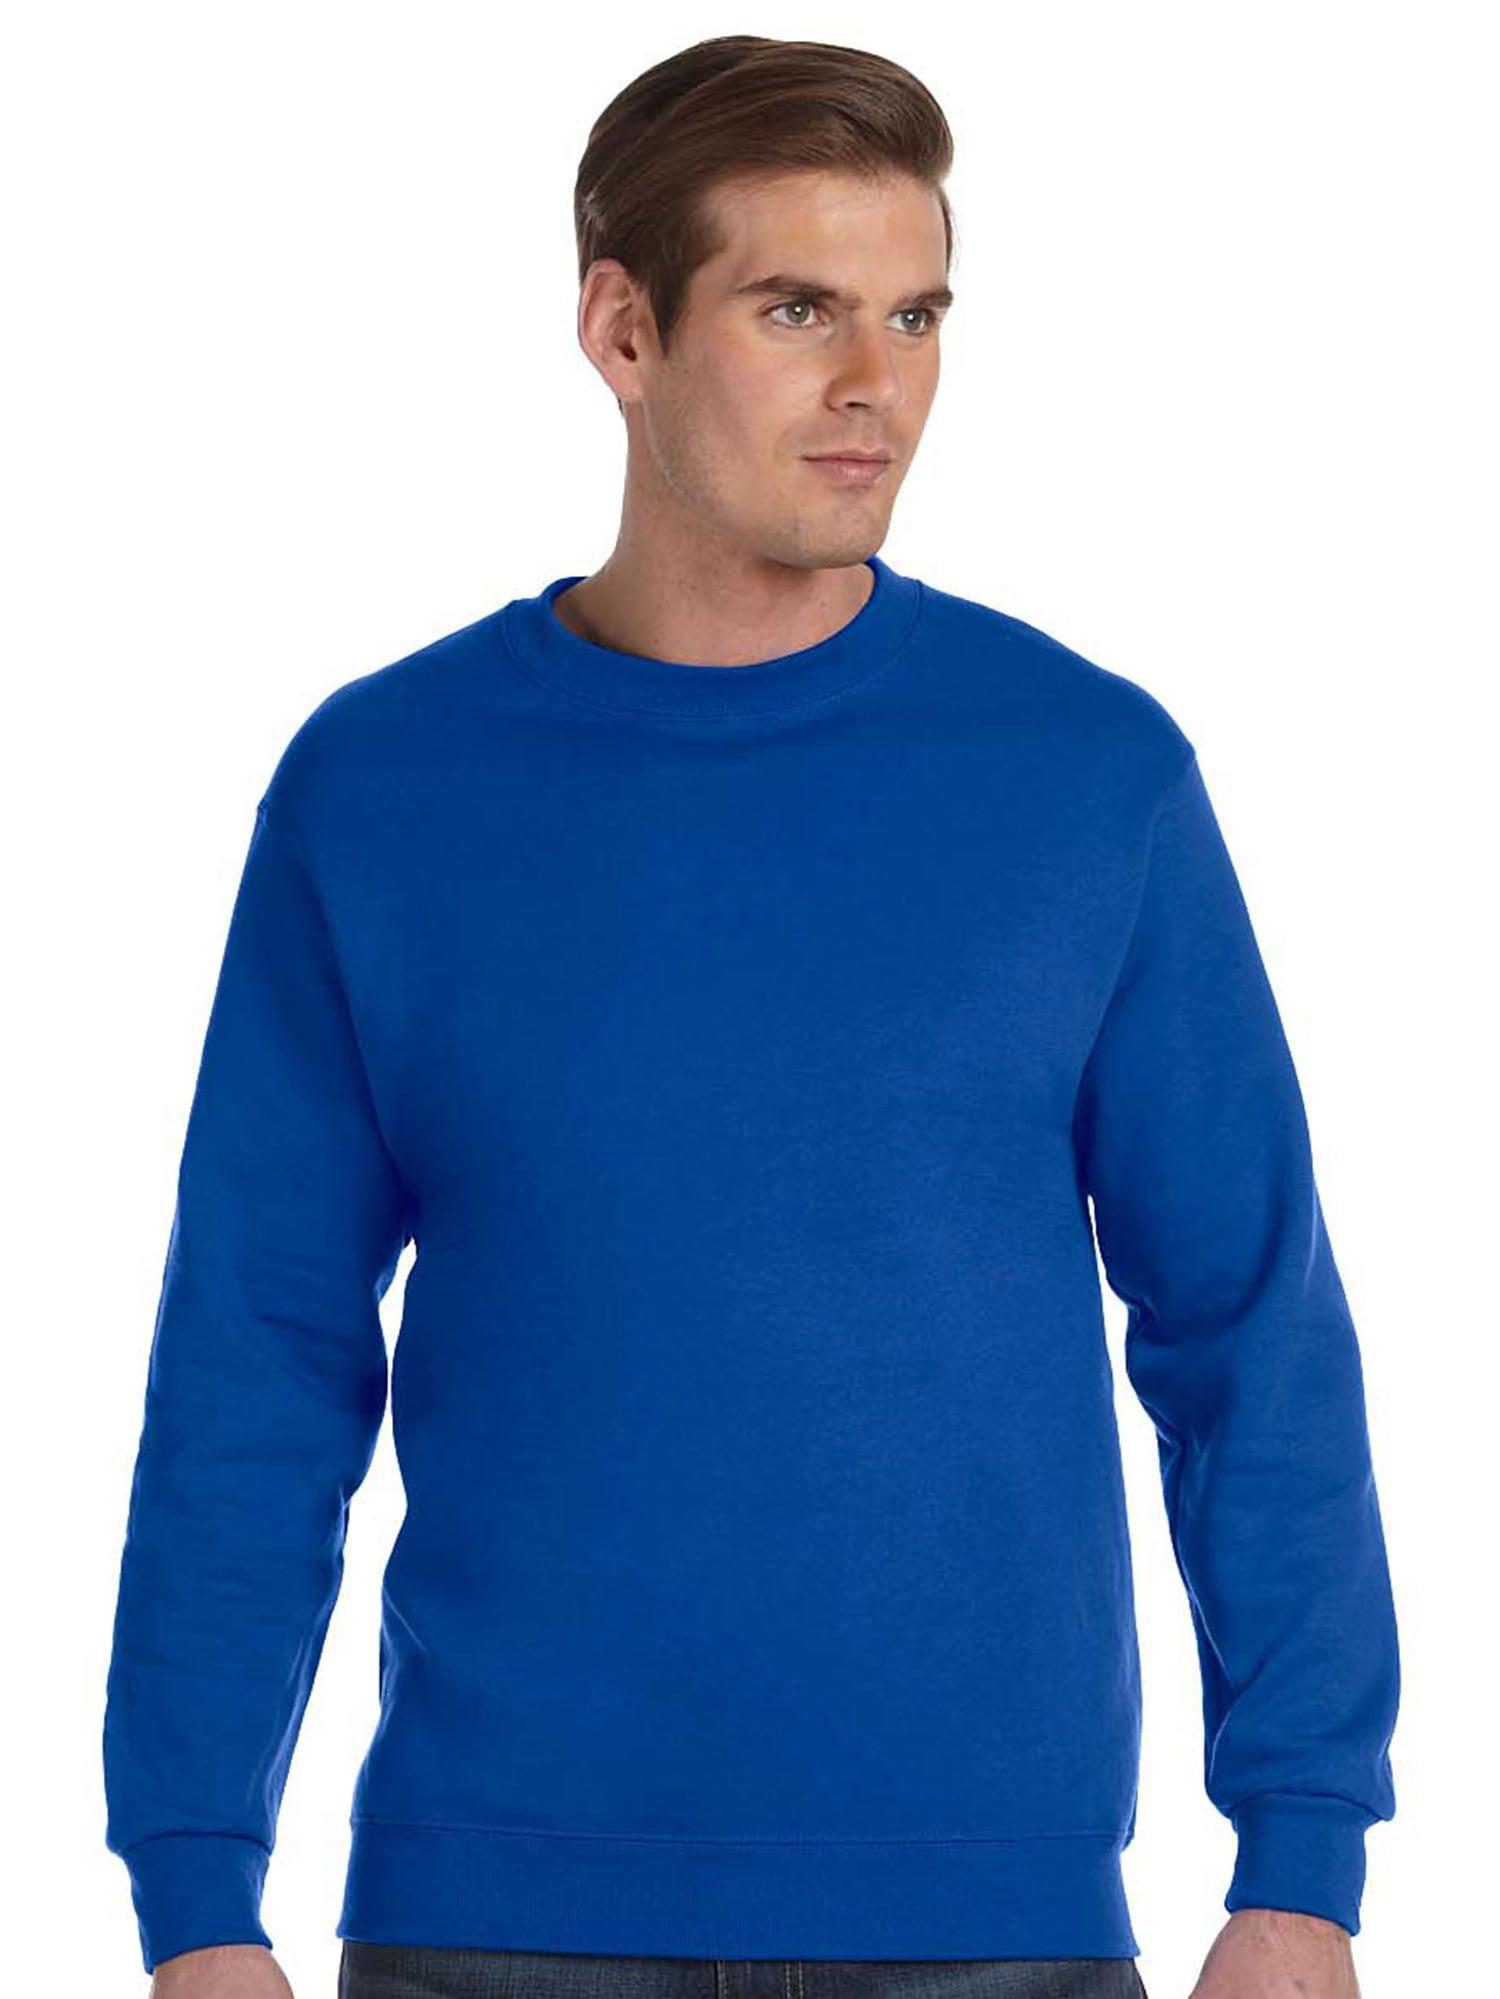 8d689763d Gildan - Gildan Mens Ultra Blend Fleece Crewneck Sweatshirt, Royal, 3XL,  Style, G120 - Walmart.com